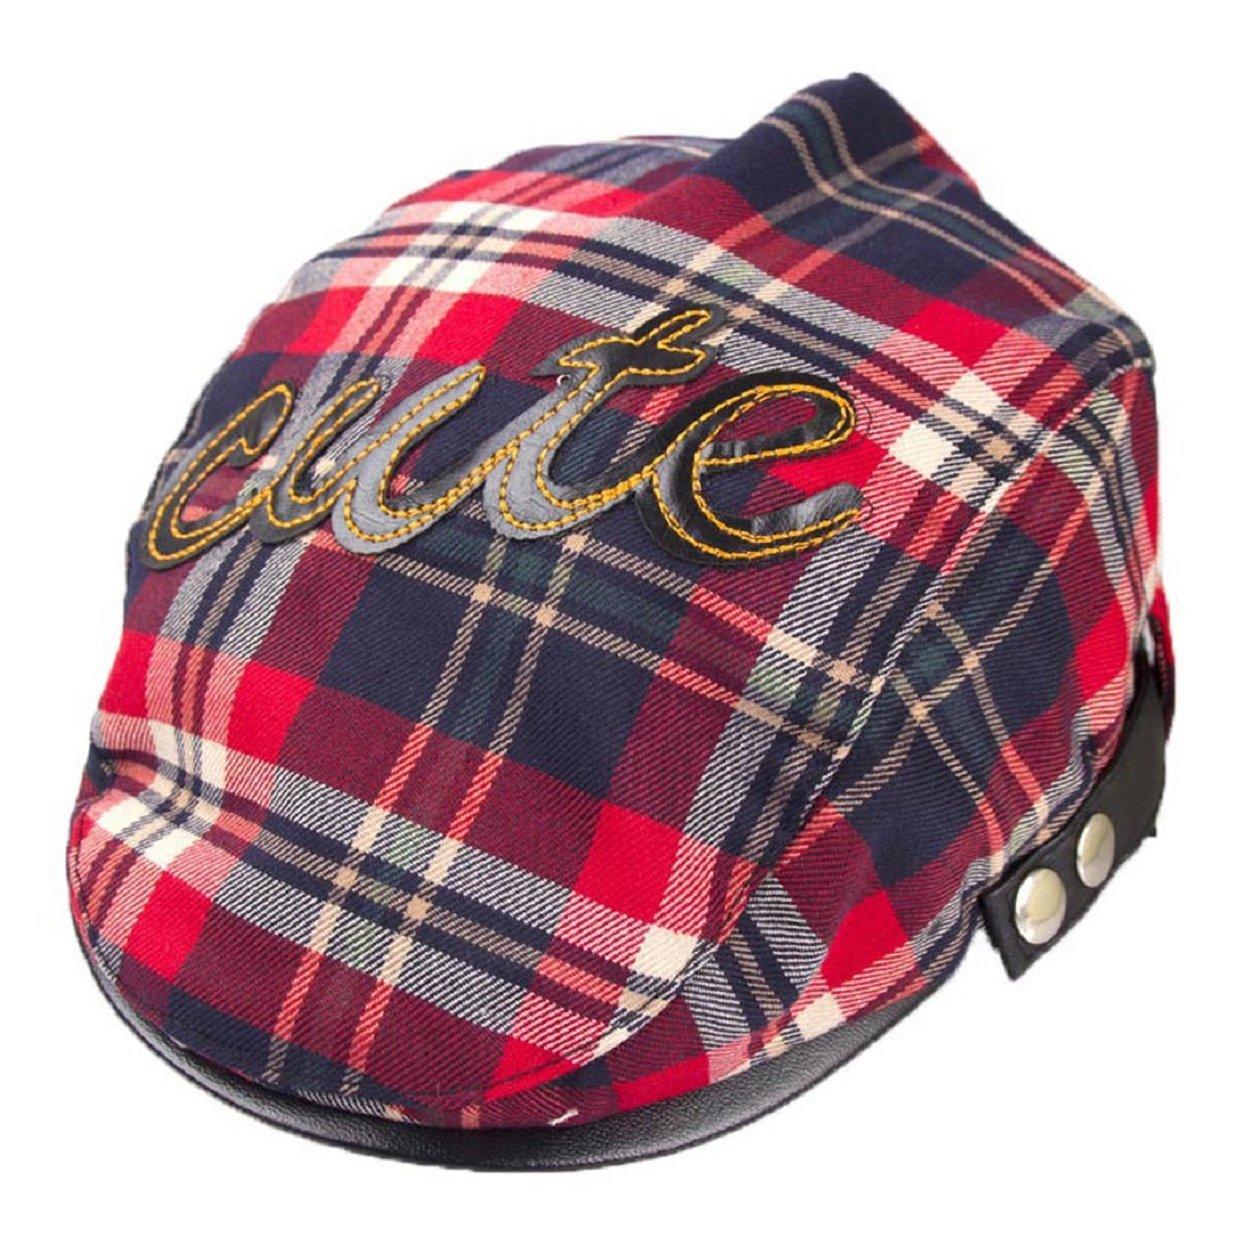 Malloom® Baby Kids Toddler Plaid Beret Cap Hat Cap (Blue) ABN-541002